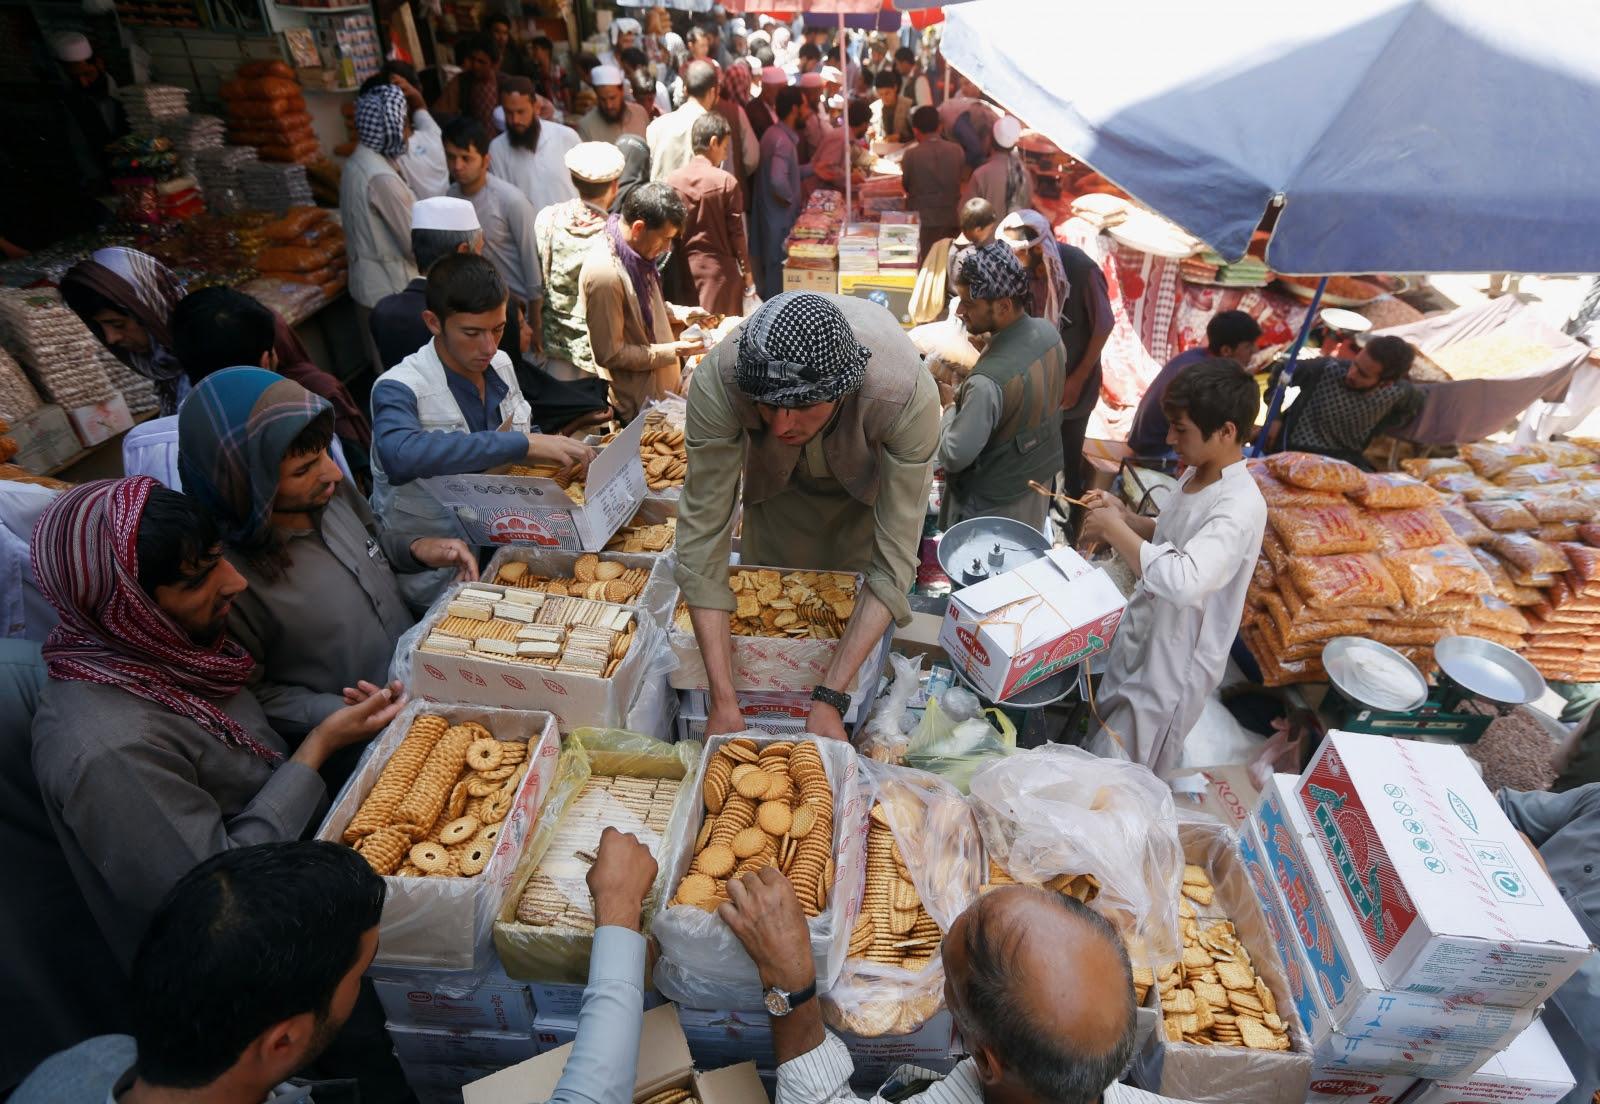 Eid al-Fitr 2016: What is the Islamic celebration marking